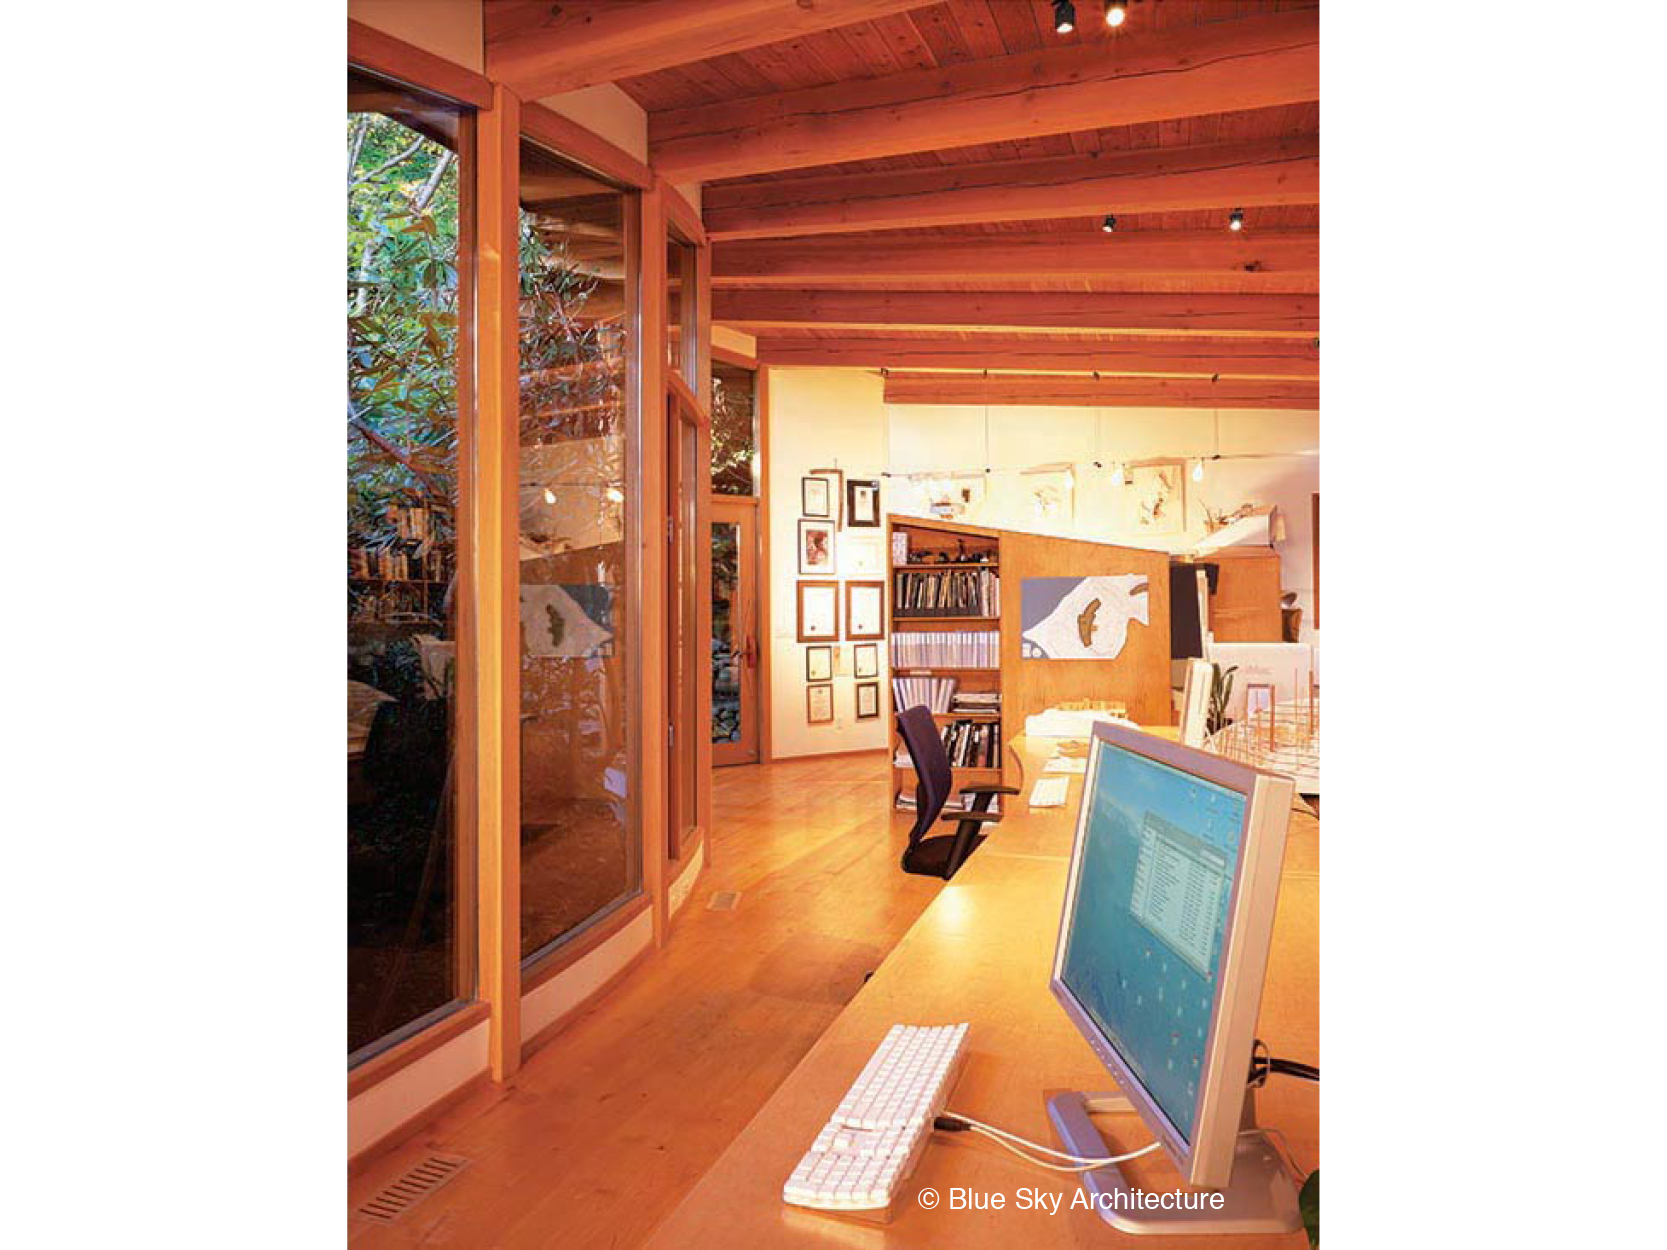 West Coast Modern Interior Studio